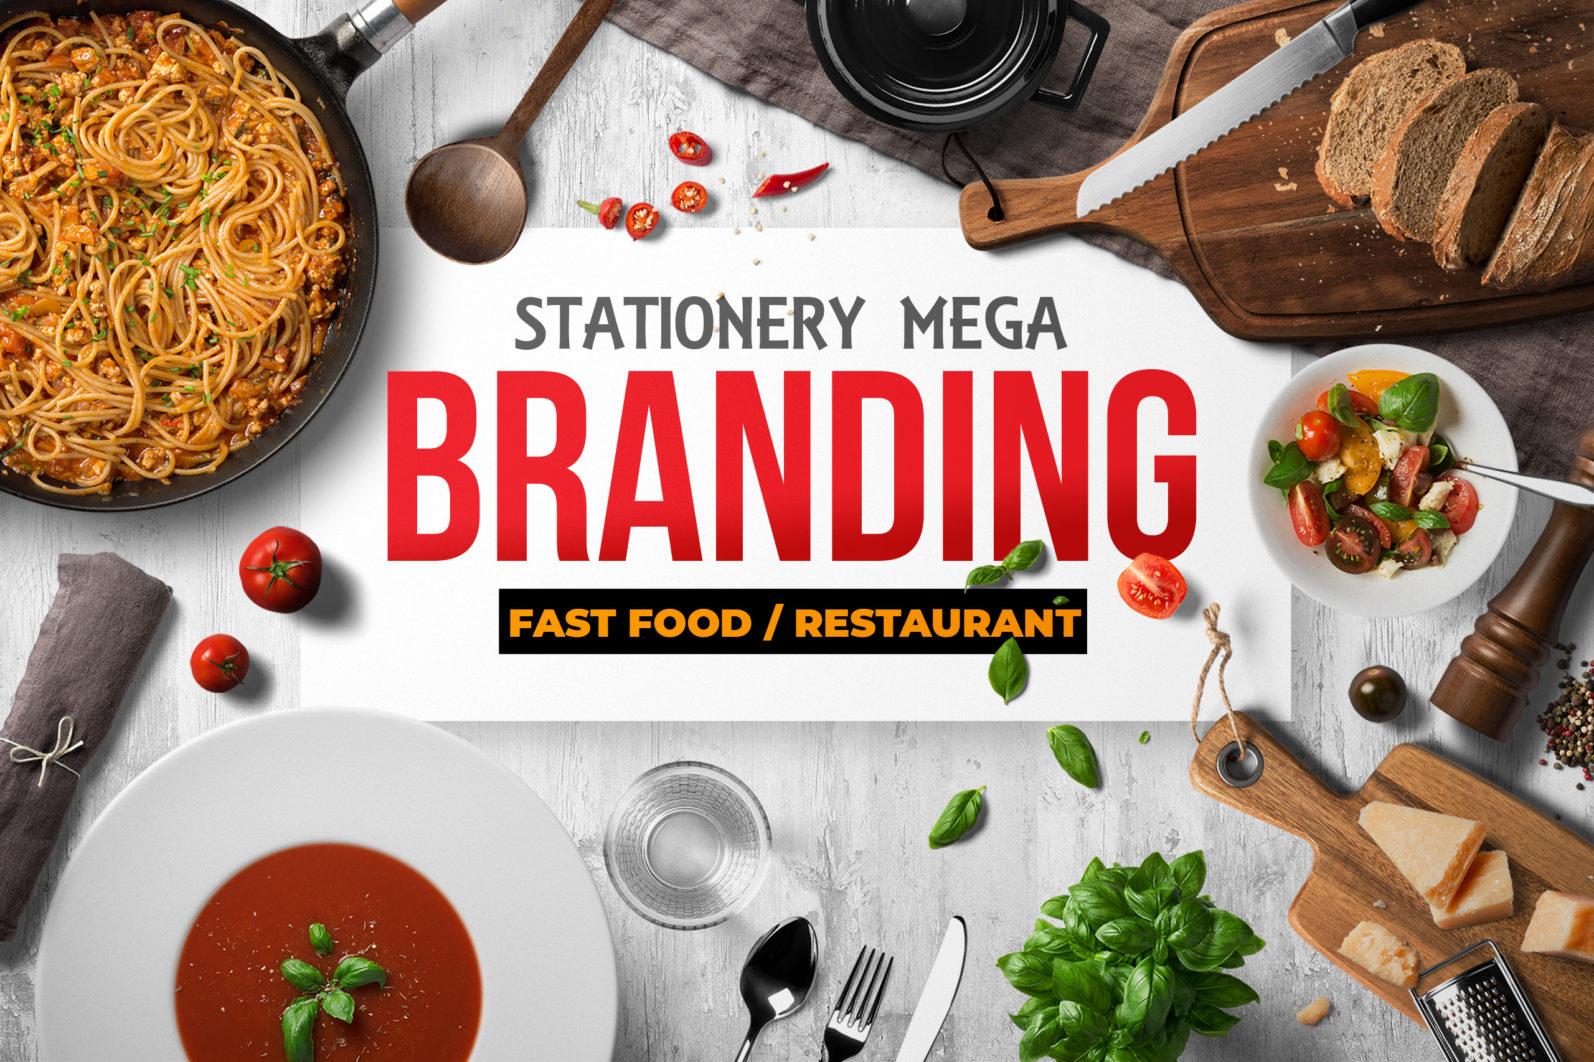 Mega Stationery Branding Identity for Fast Food and Restaurant - 00 Fast Food Branding identity Header -